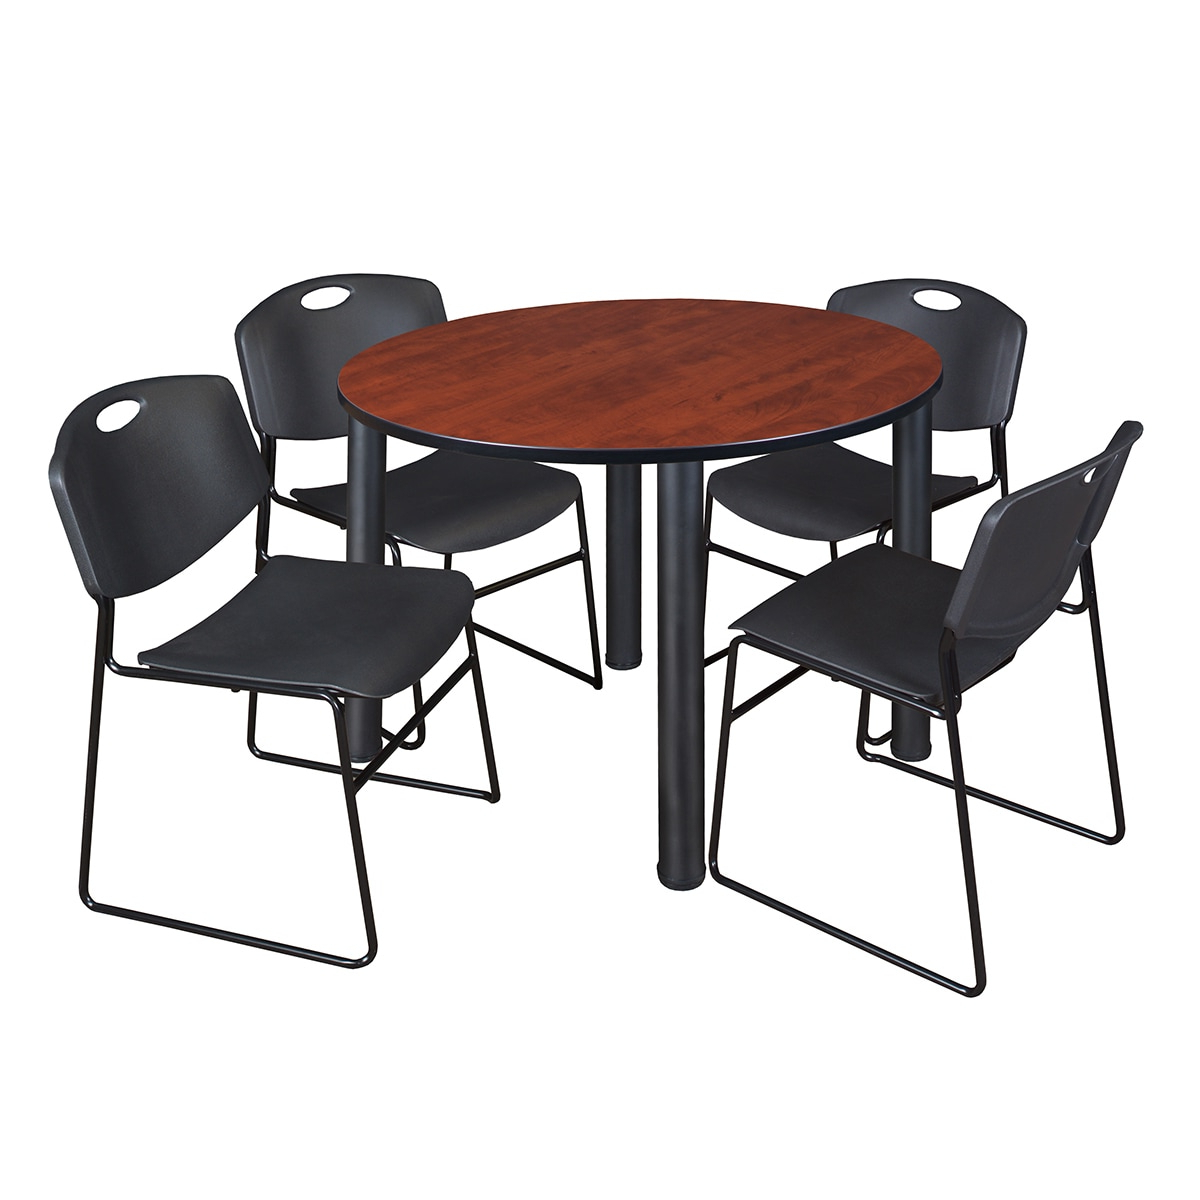 "2019 Kee 48"" Round Breakroom Table Black & 4 Zeng Stack Chairs Within Round Breakroom Tables And Chair Set (View 18 of 20)"